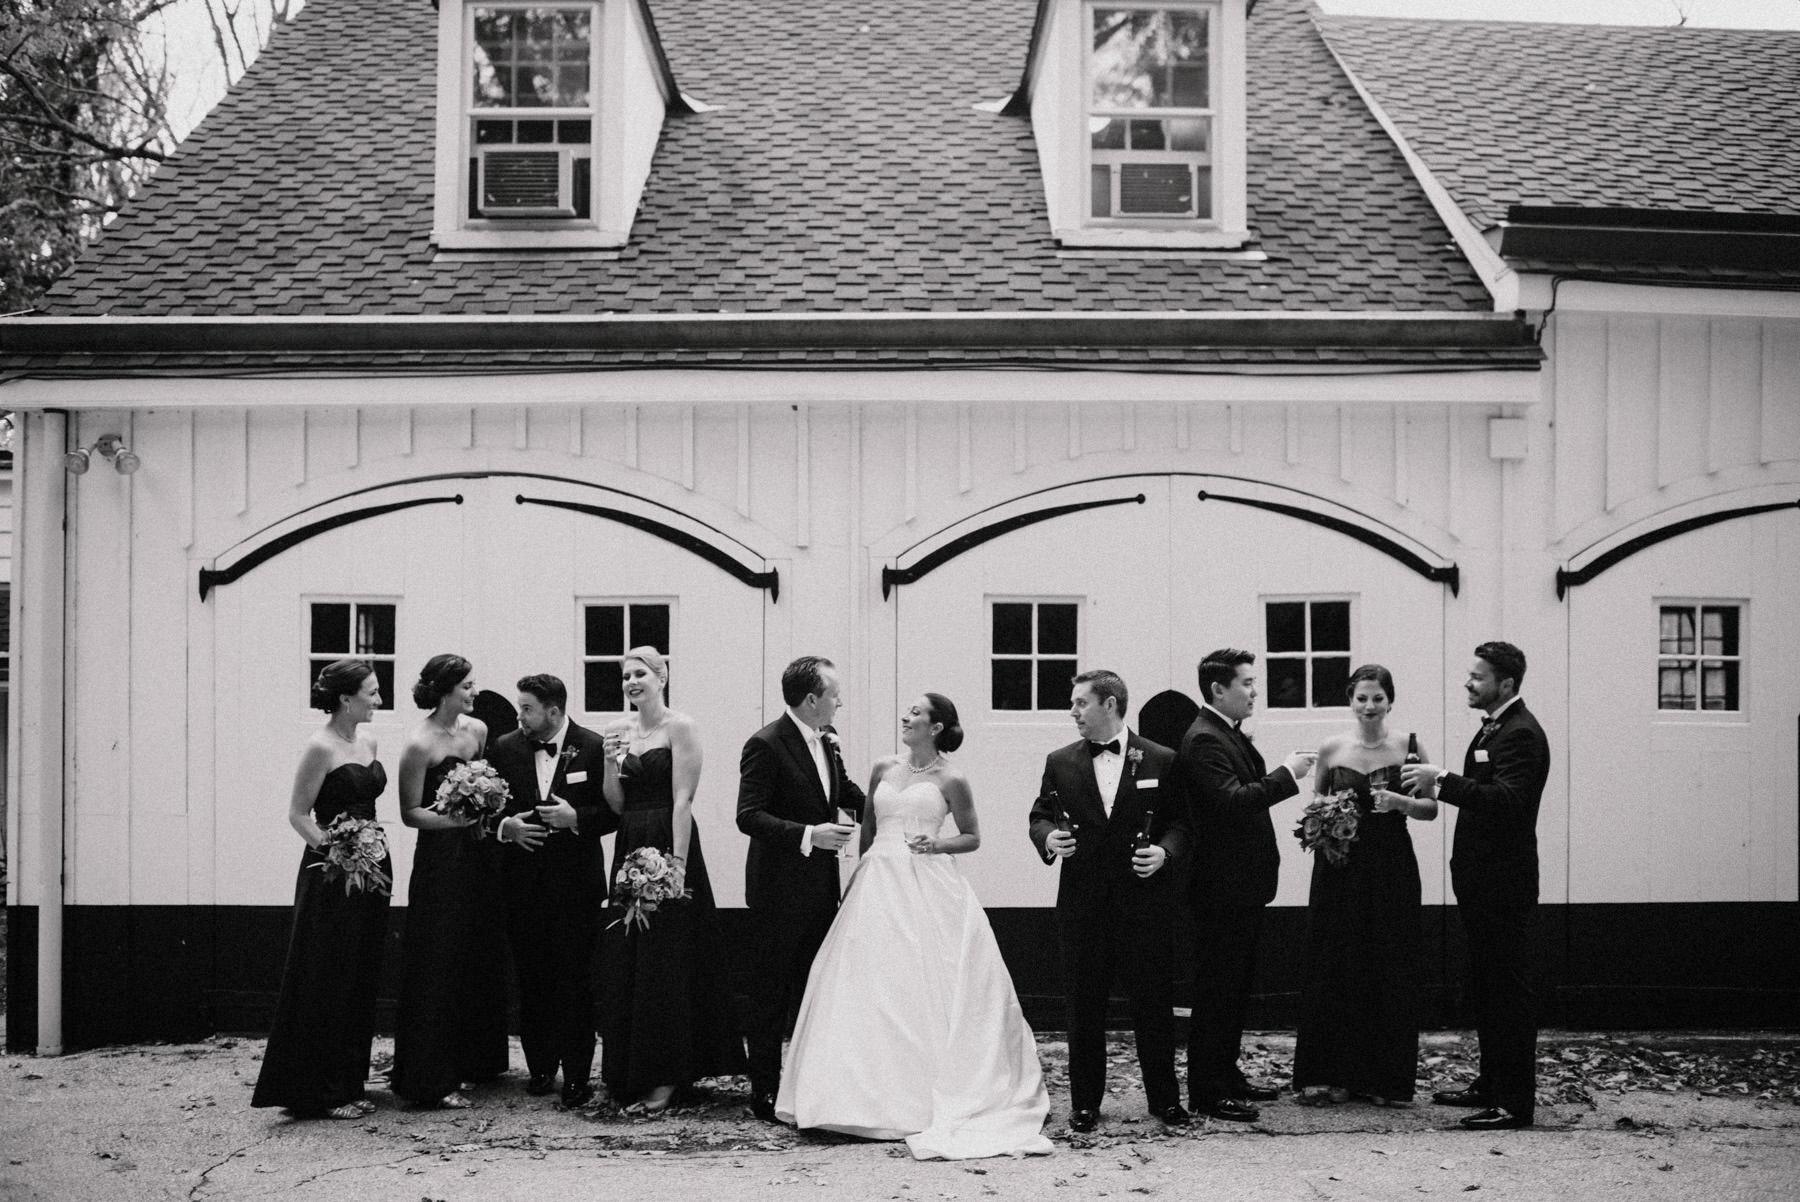 187-appleford-estate-wedding-4-2.jpg